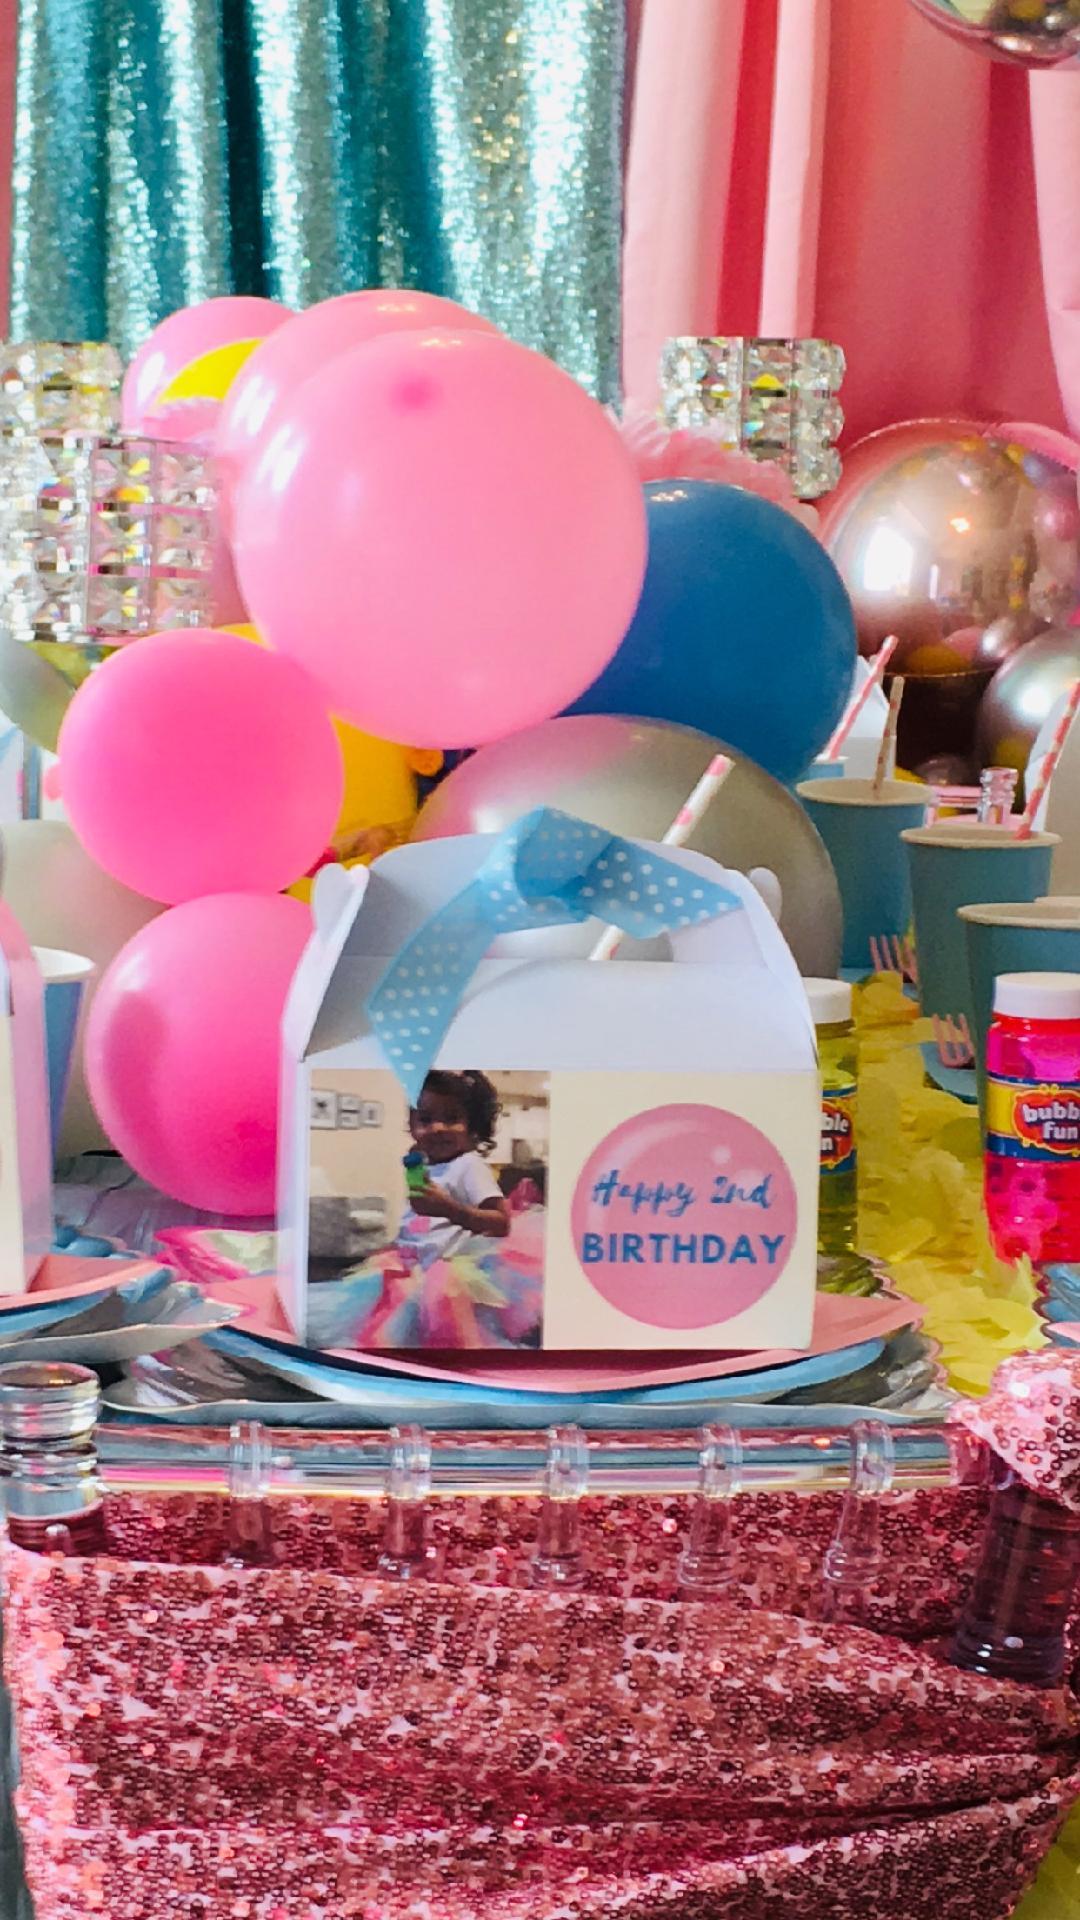 houston kids childrens birthday party planner 2.jpg